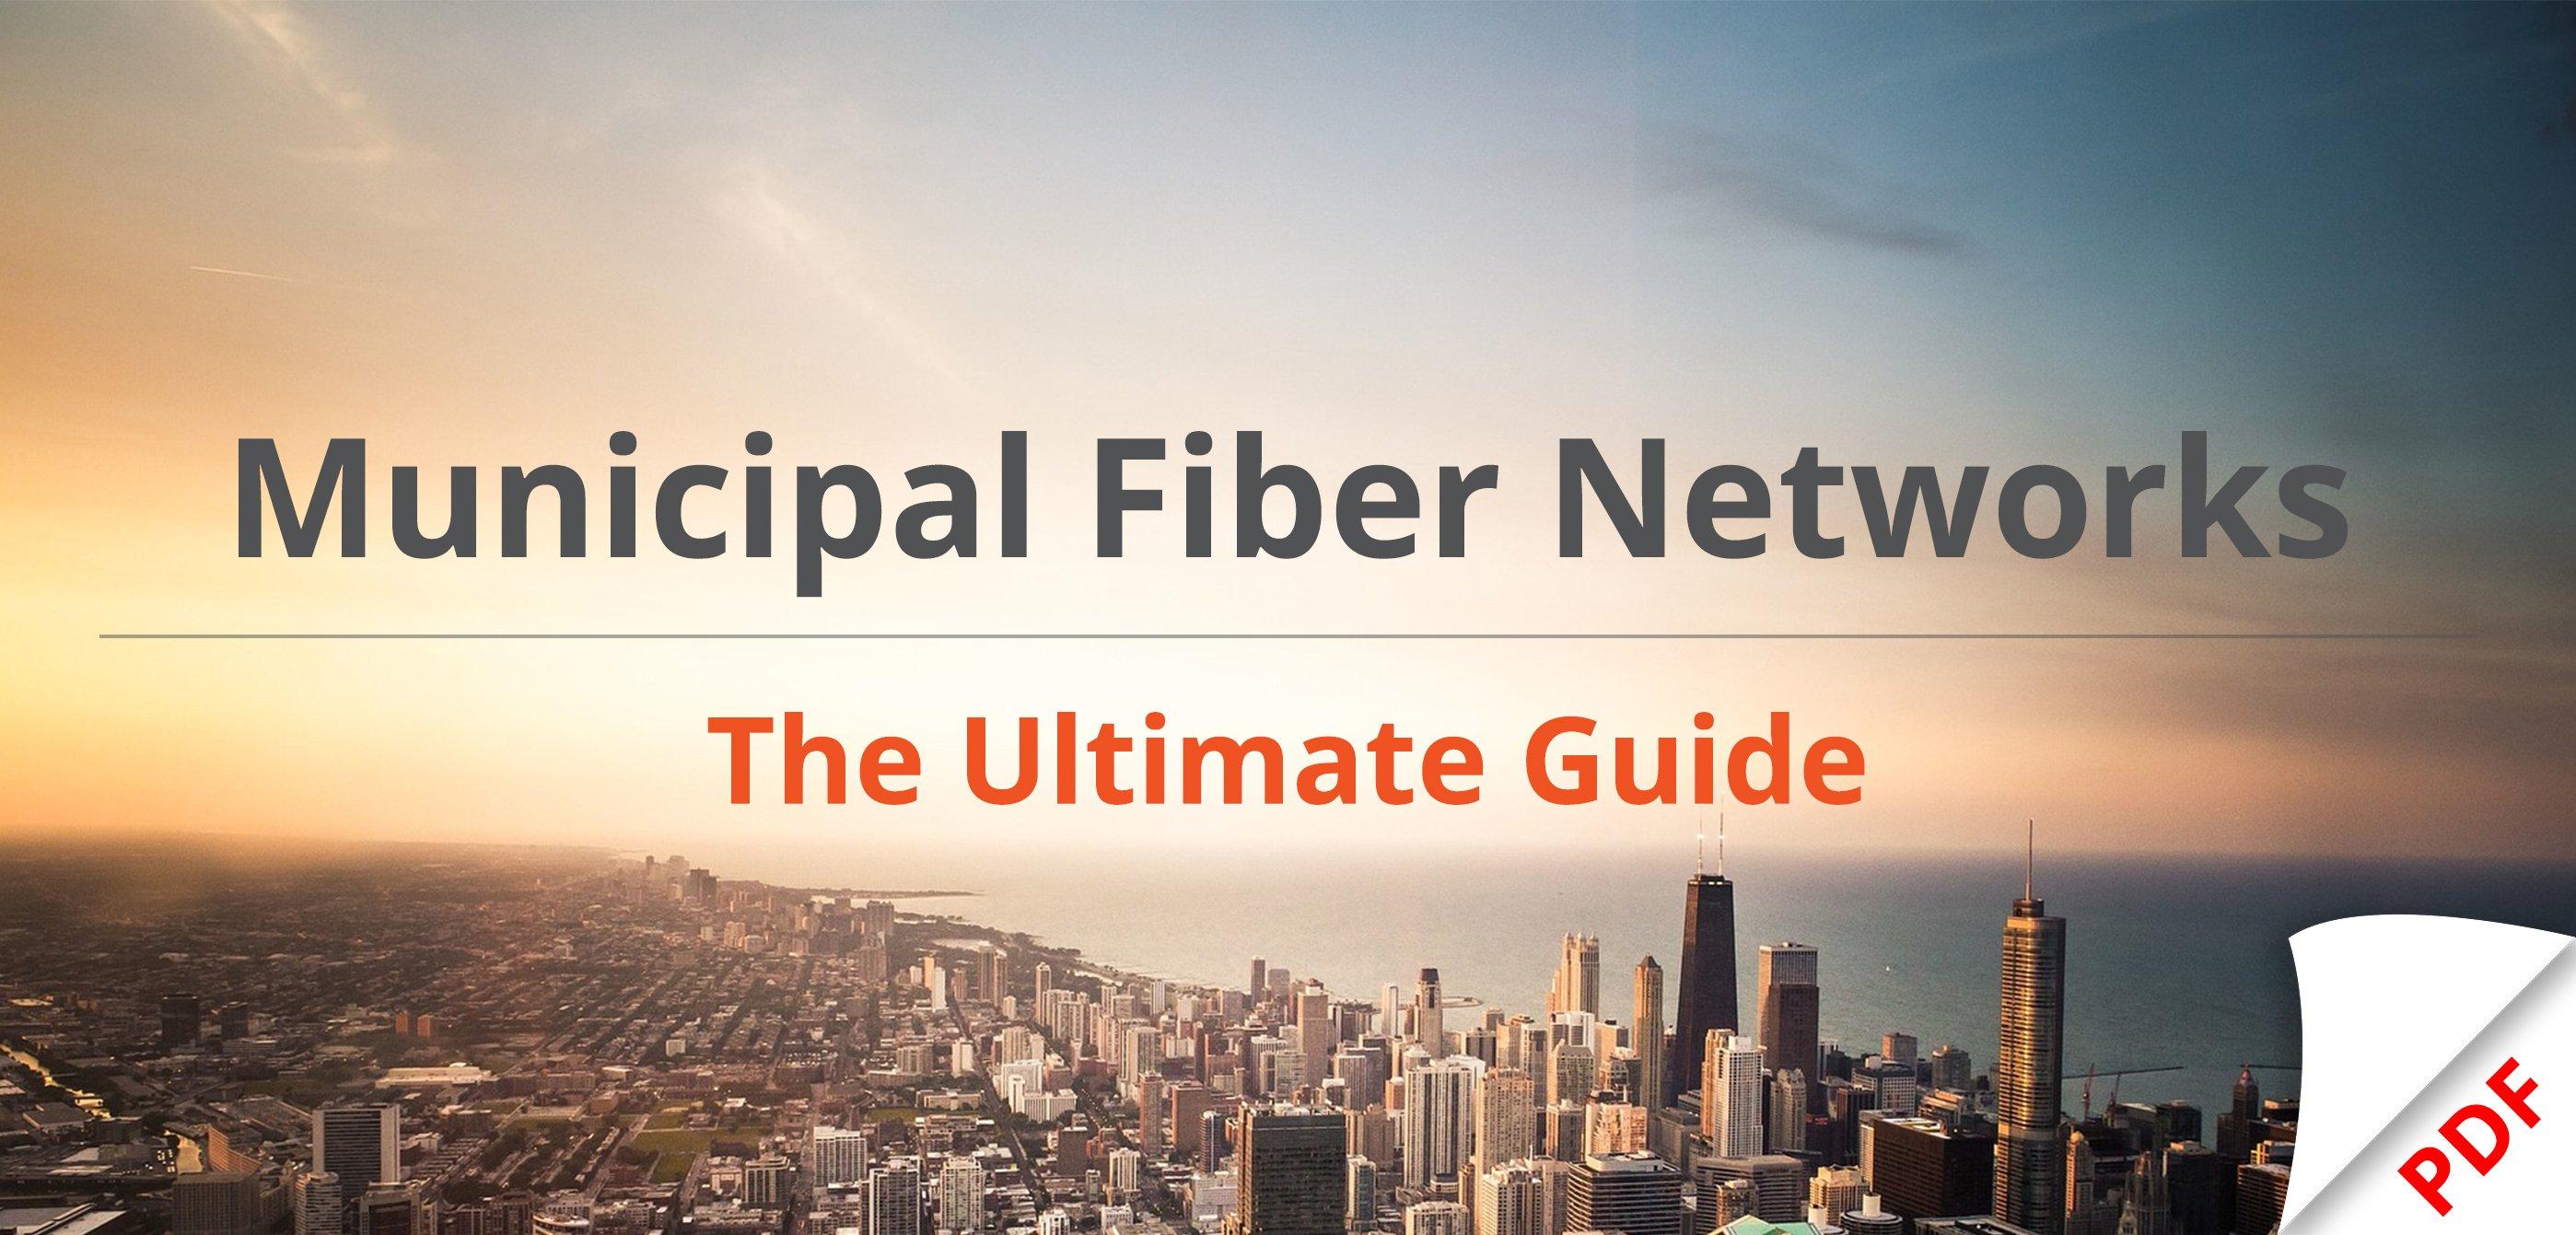 Download - Municipal Fiber Network - Landing Page (featured image)